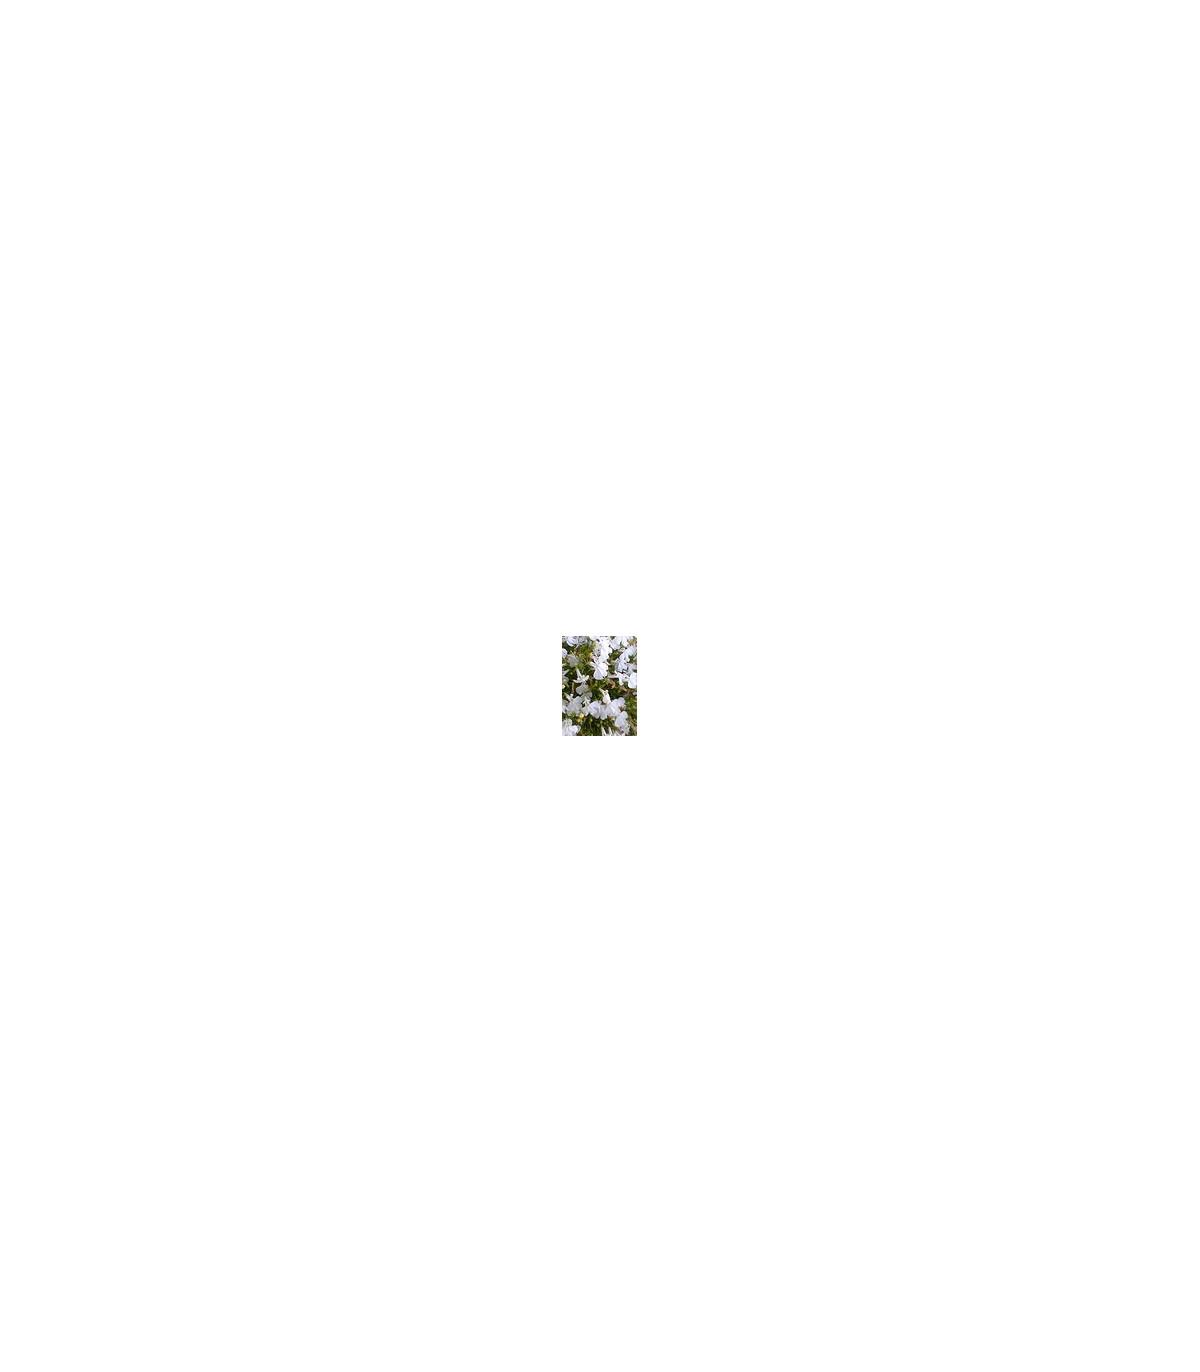 Lobelka drobná nízká - směs - Lobelia erinus - semena Lobelky - 1000 ks